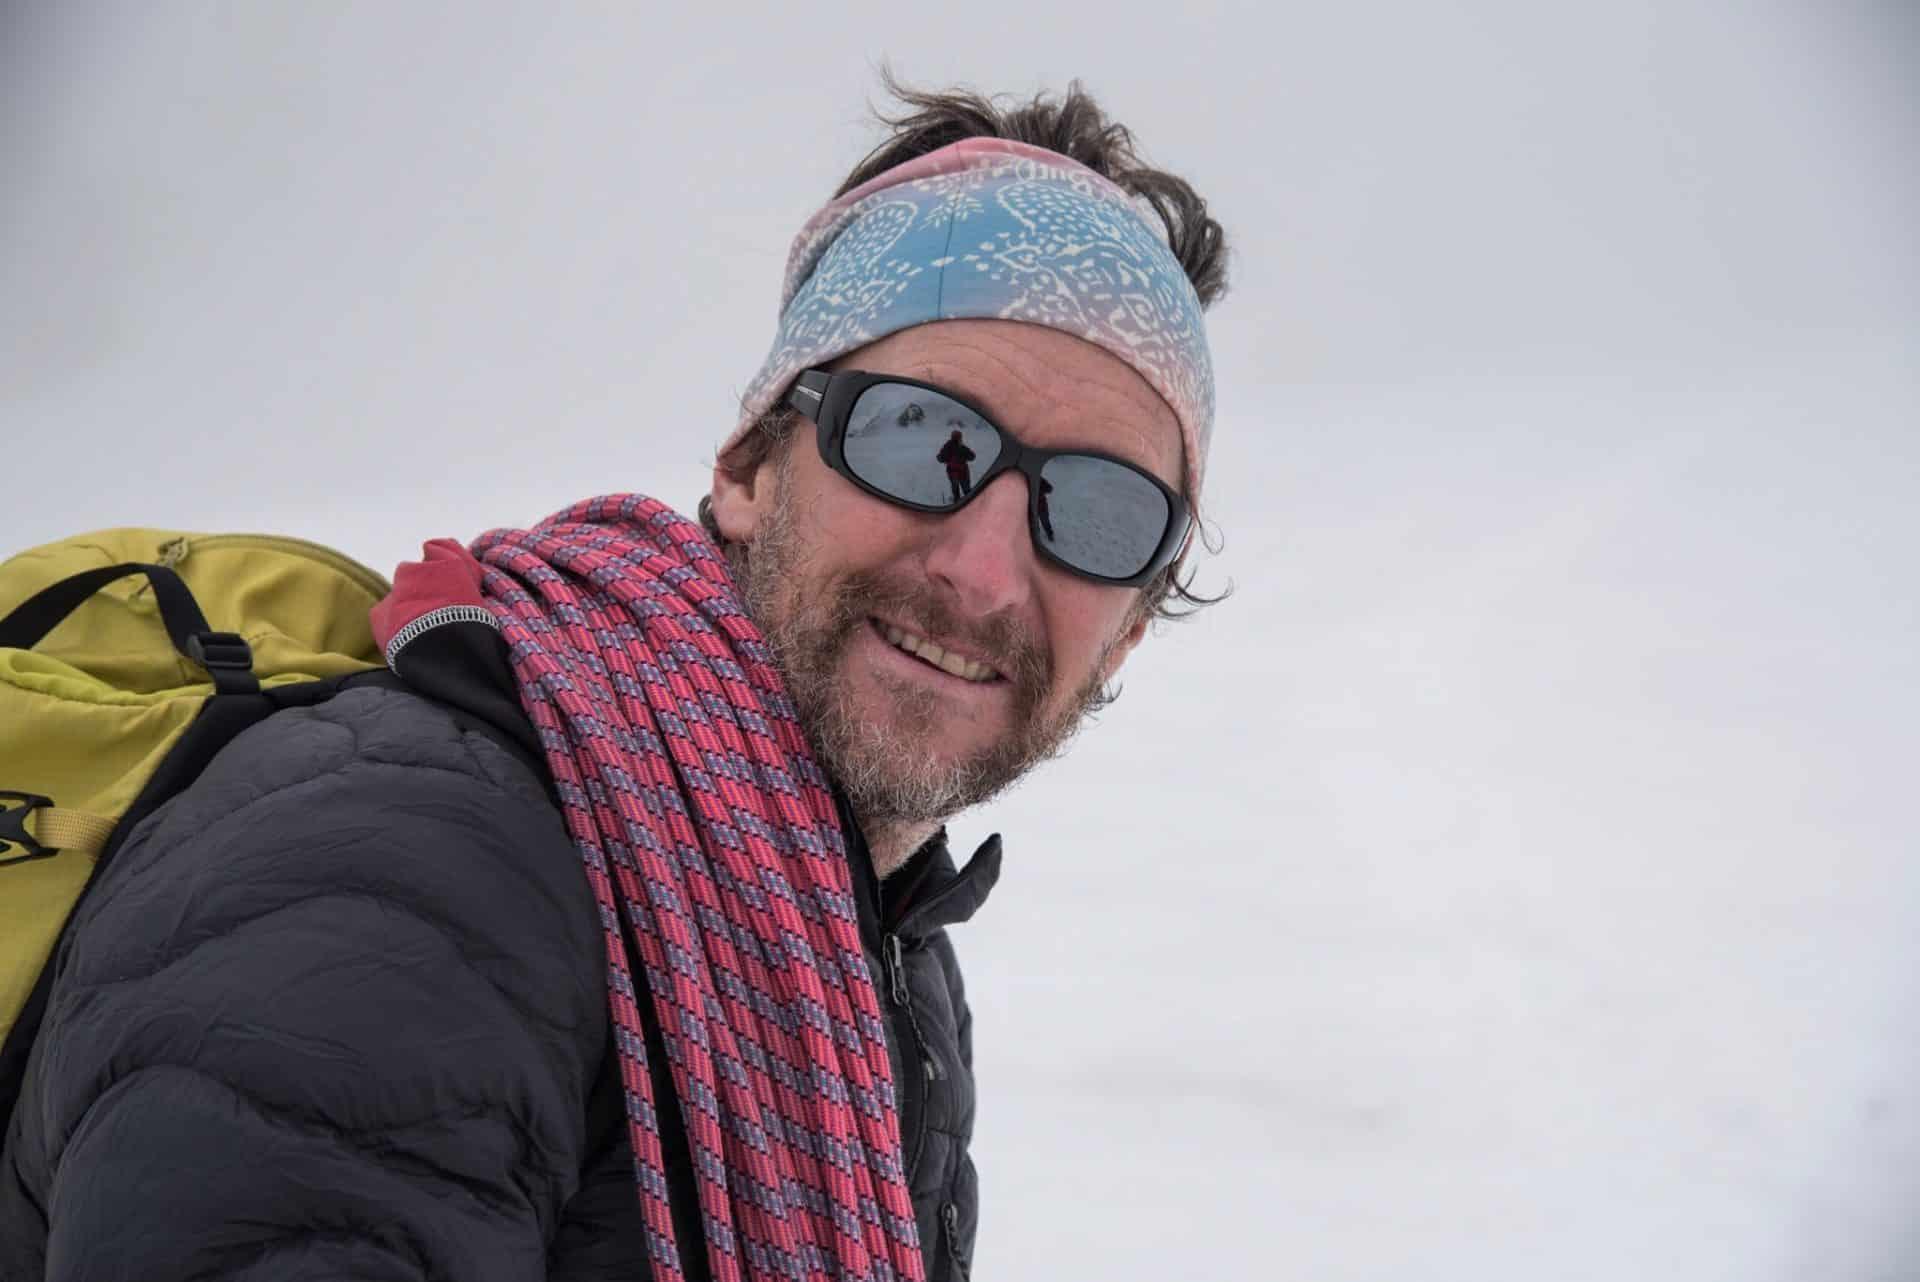 James Kaler IFMGA Guide Chamonix